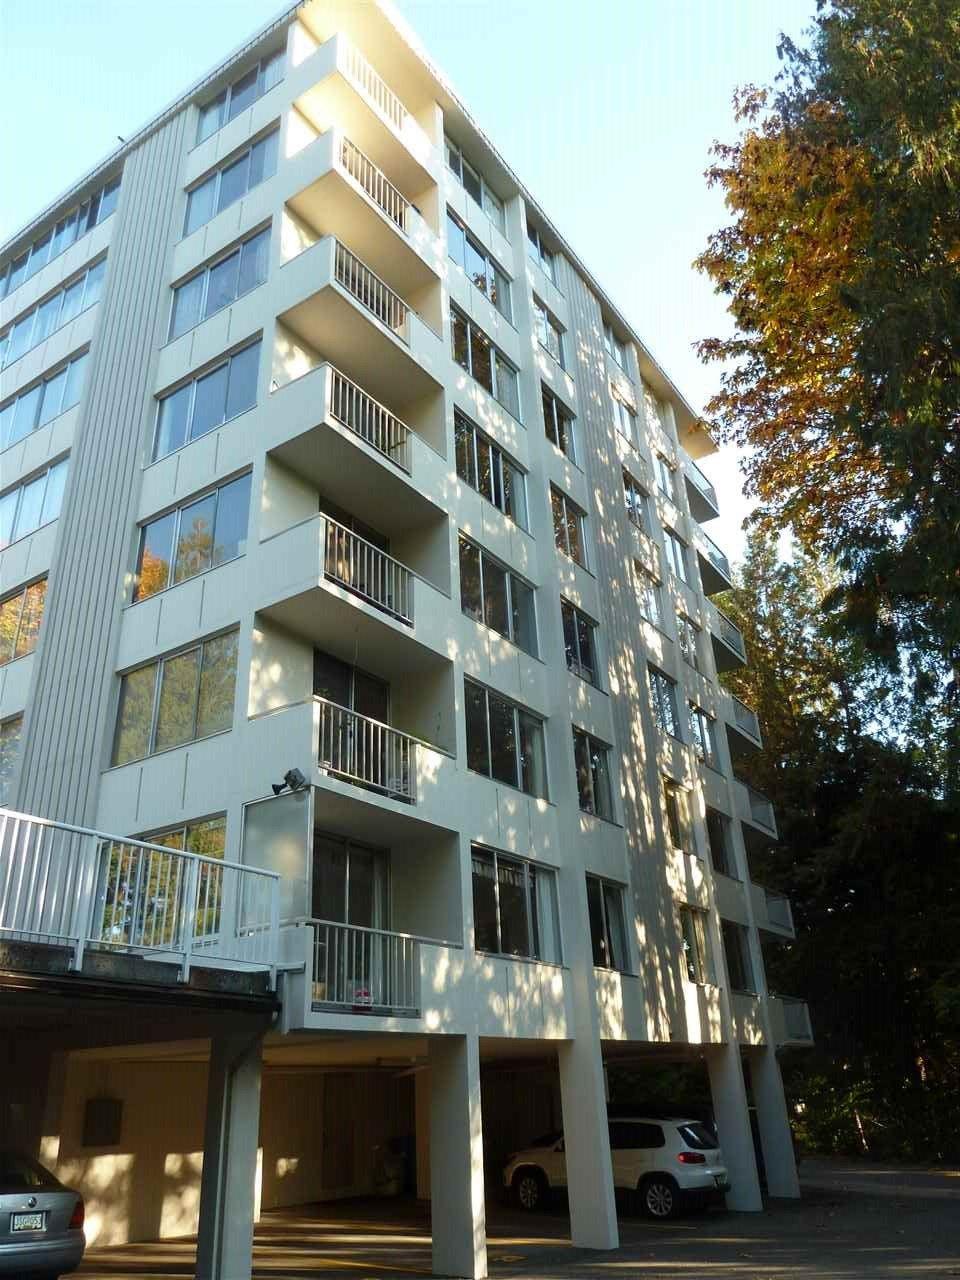 Main Photo: 103 1785 ESQUIMALT Avenue in West Vancouver: Ambleside Condo for sale : MLS®# R2330636